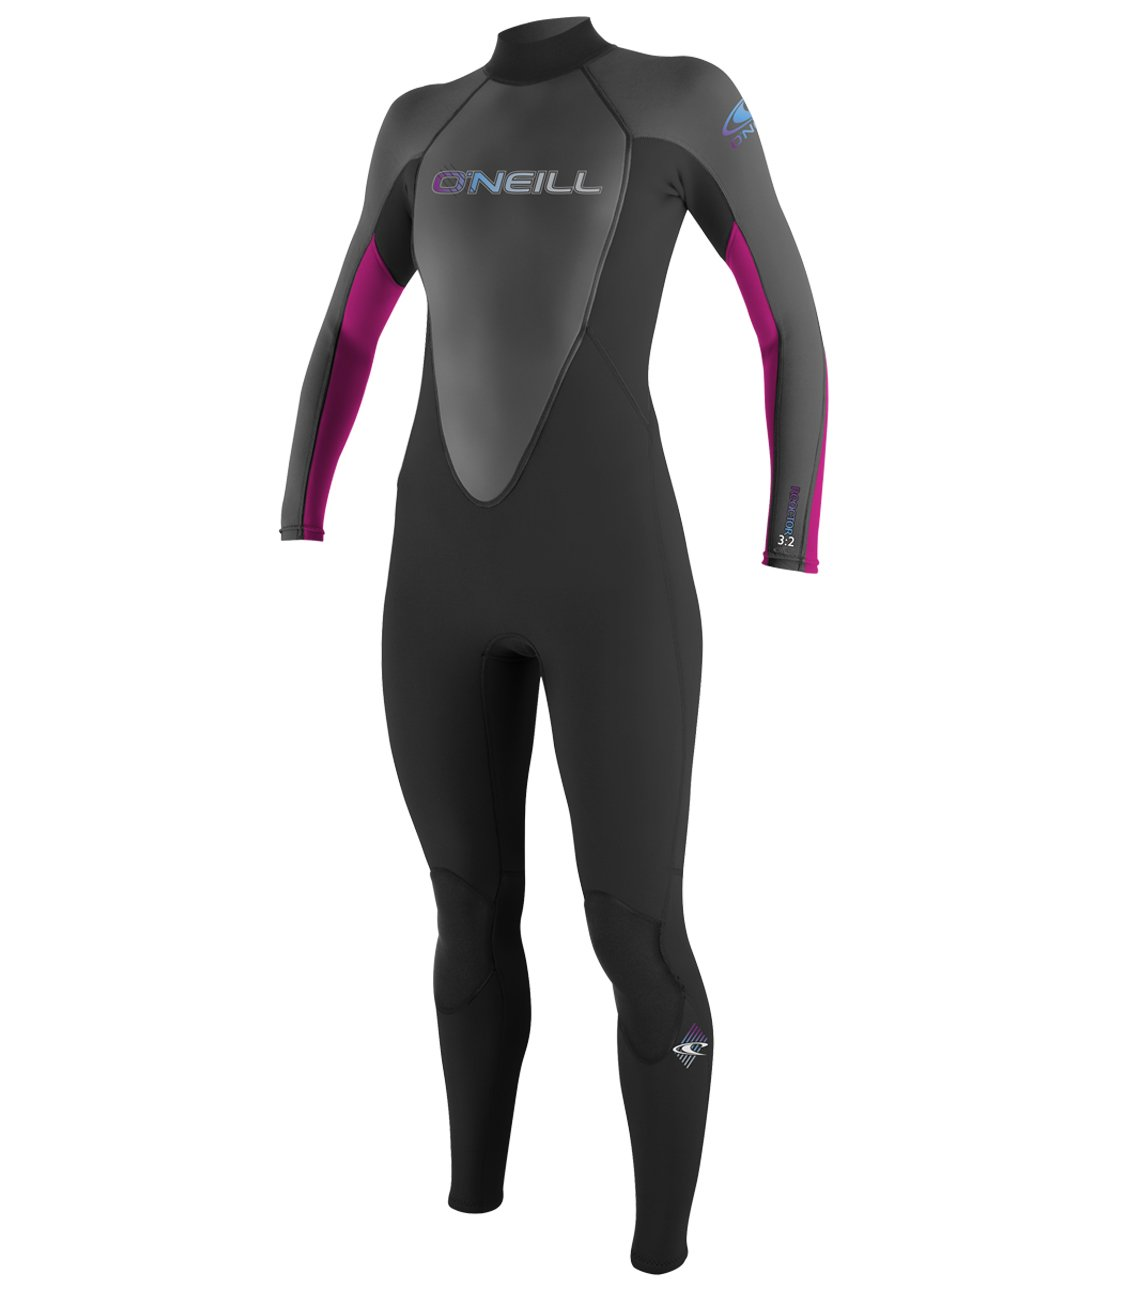 O'Neill   Women's Reactor 3/2mm Back Zip Full Wetsuit,Black/Graphite/Berry,4